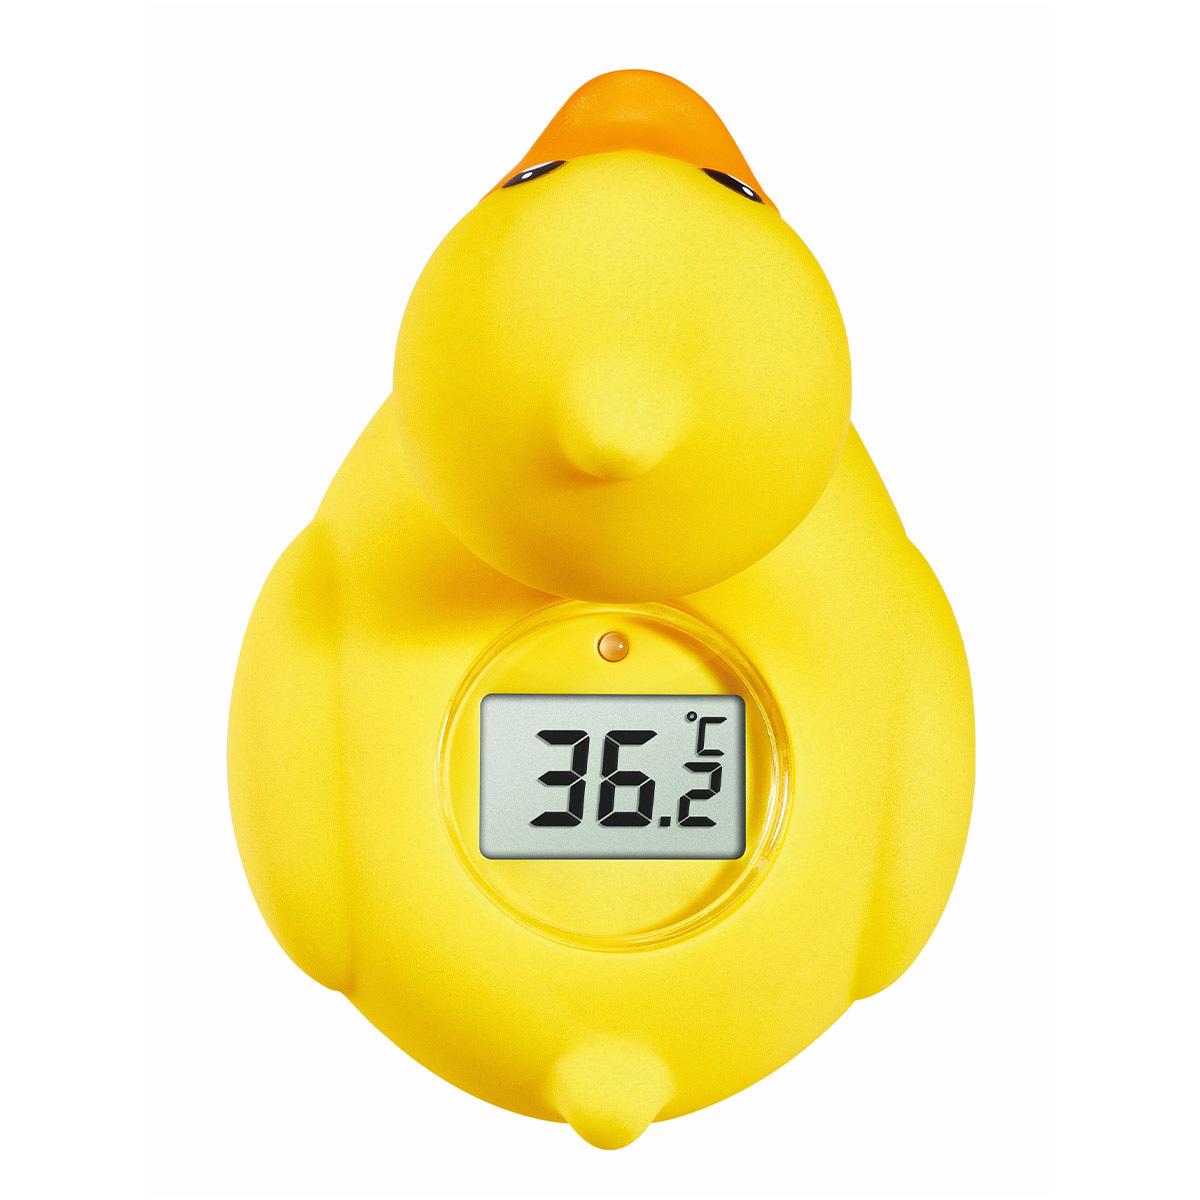 30-2031-07-digitales-badethermometer-ducky-anwendung-1200x1200px.jpg